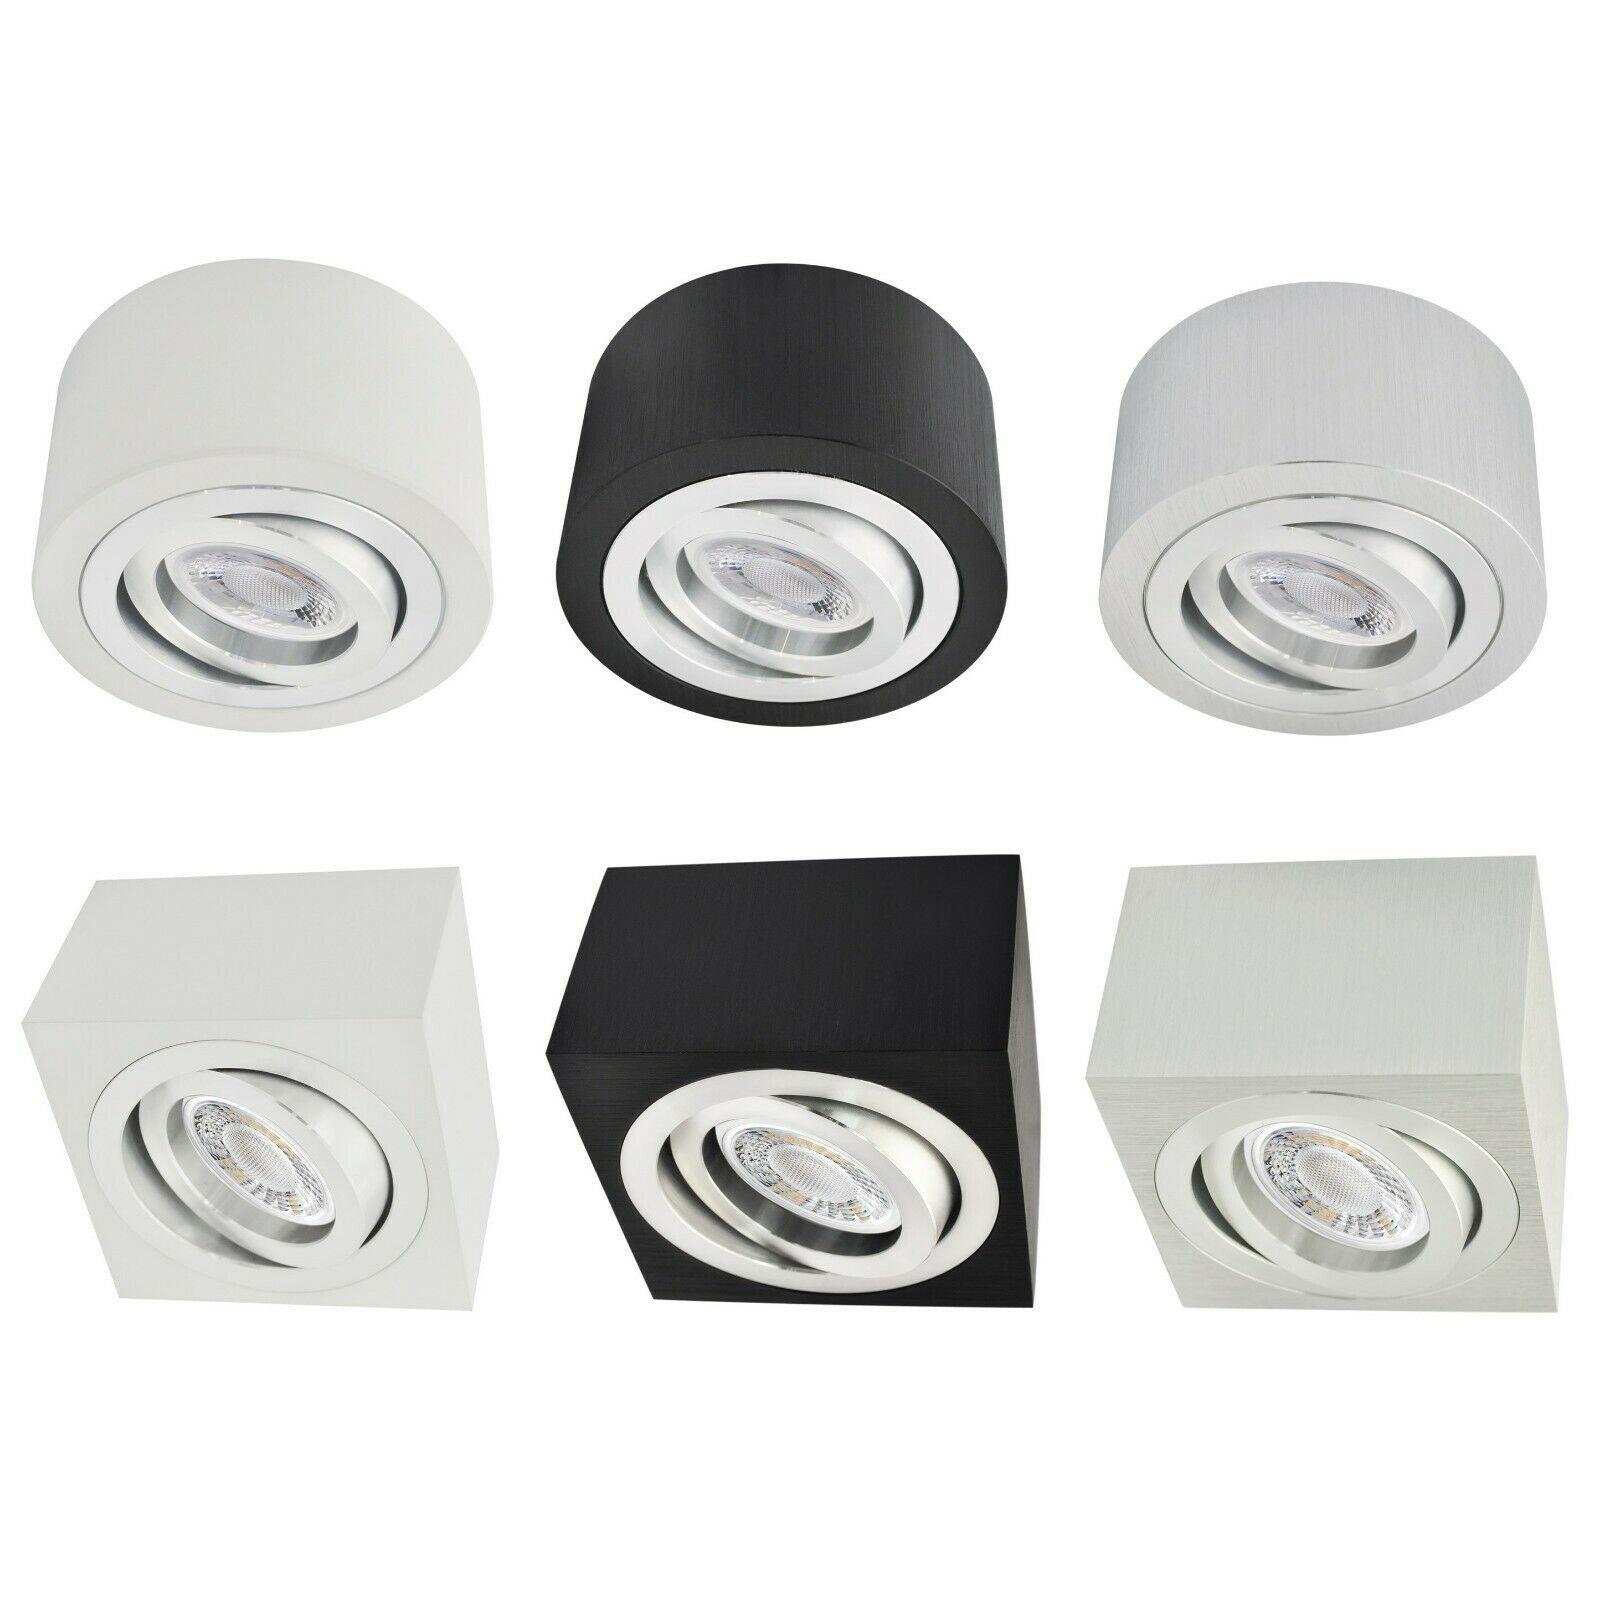 LED Aufbaustrahler 5W dimmbar